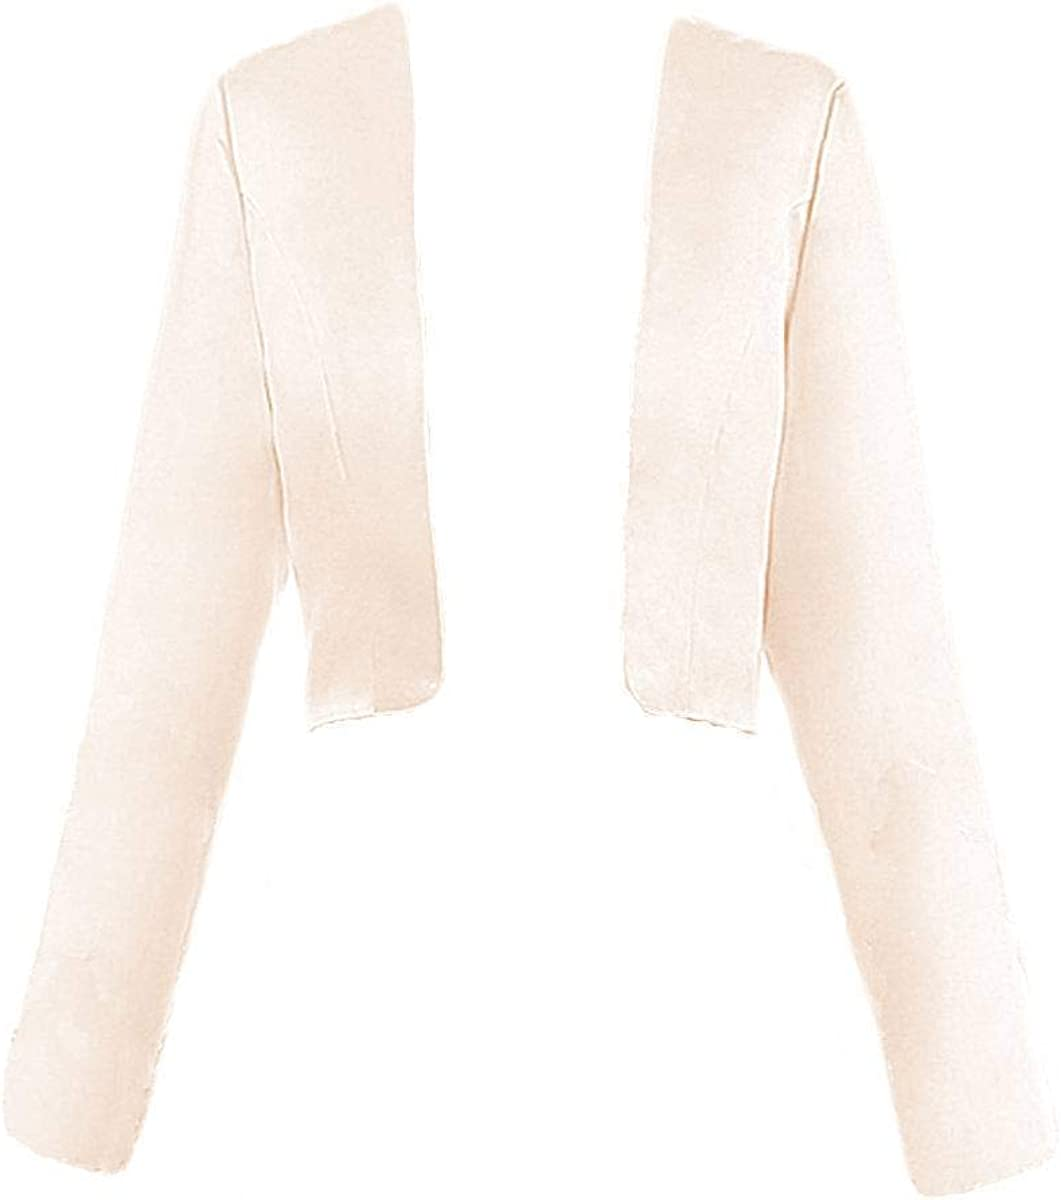 DINGZAN Satin Long Sleeve Jacket Formal Dress Shrugs Bridal Mother Cardigan